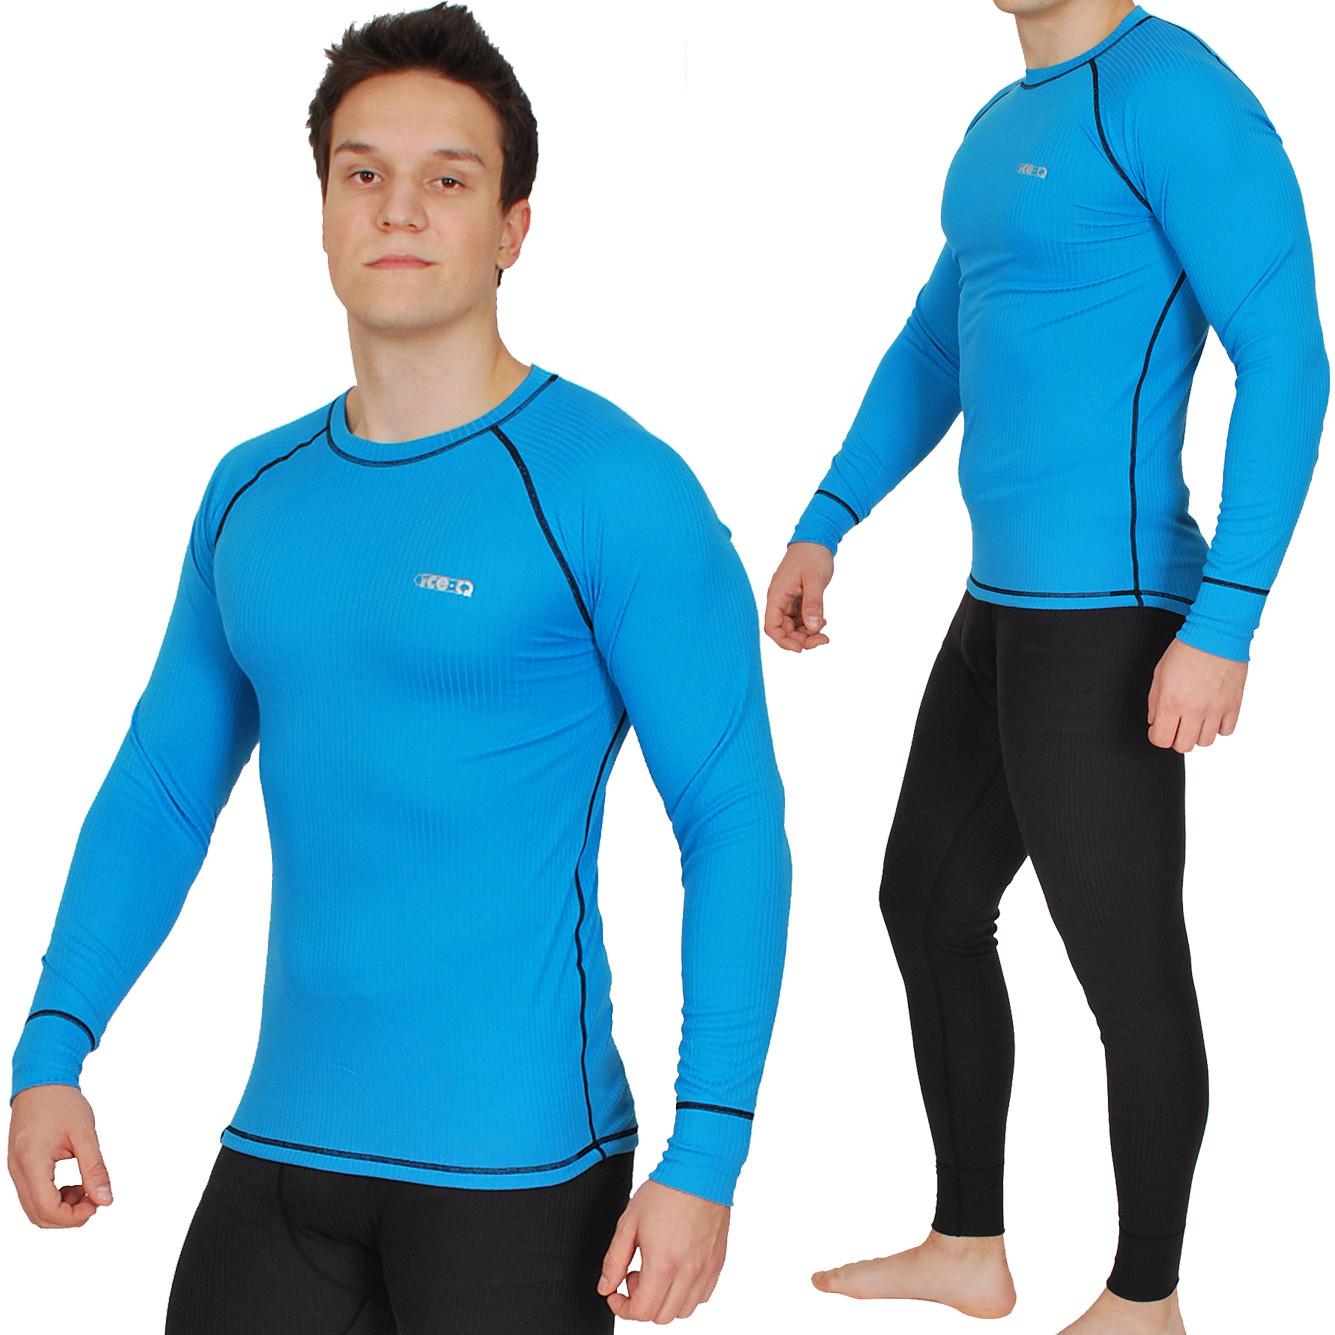 Ice-Q Męska bielizna termoaktywna Ice-Q Smart Man Blue/Black